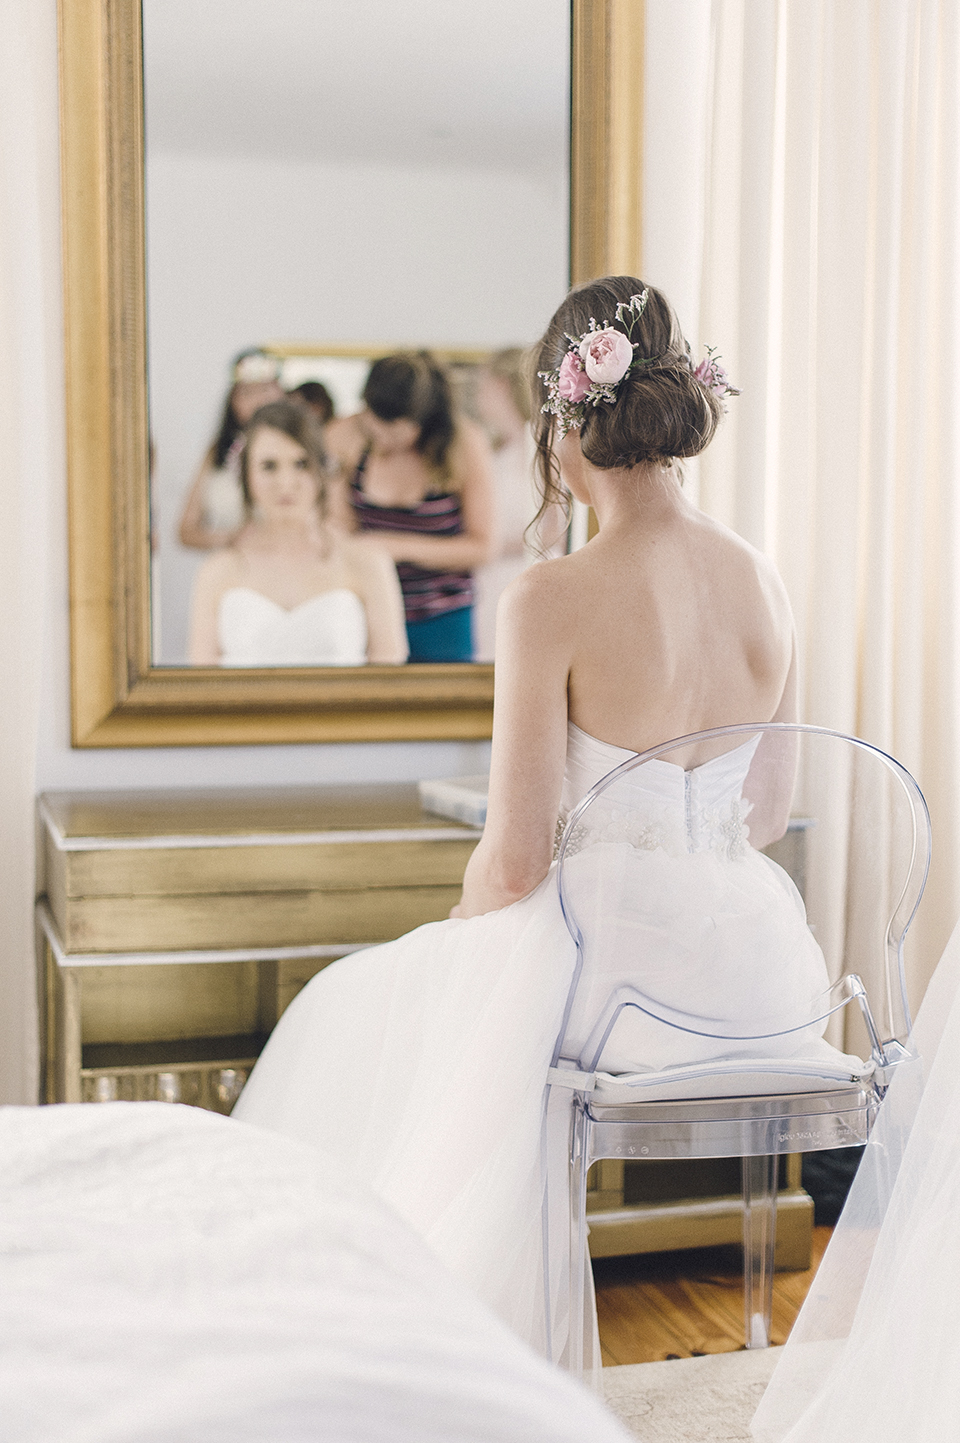 RyanParker_WeddingPhotographer_FineArt_CapeTown_BonaDea_Hermanus_S&A_DSC_1443.jpg